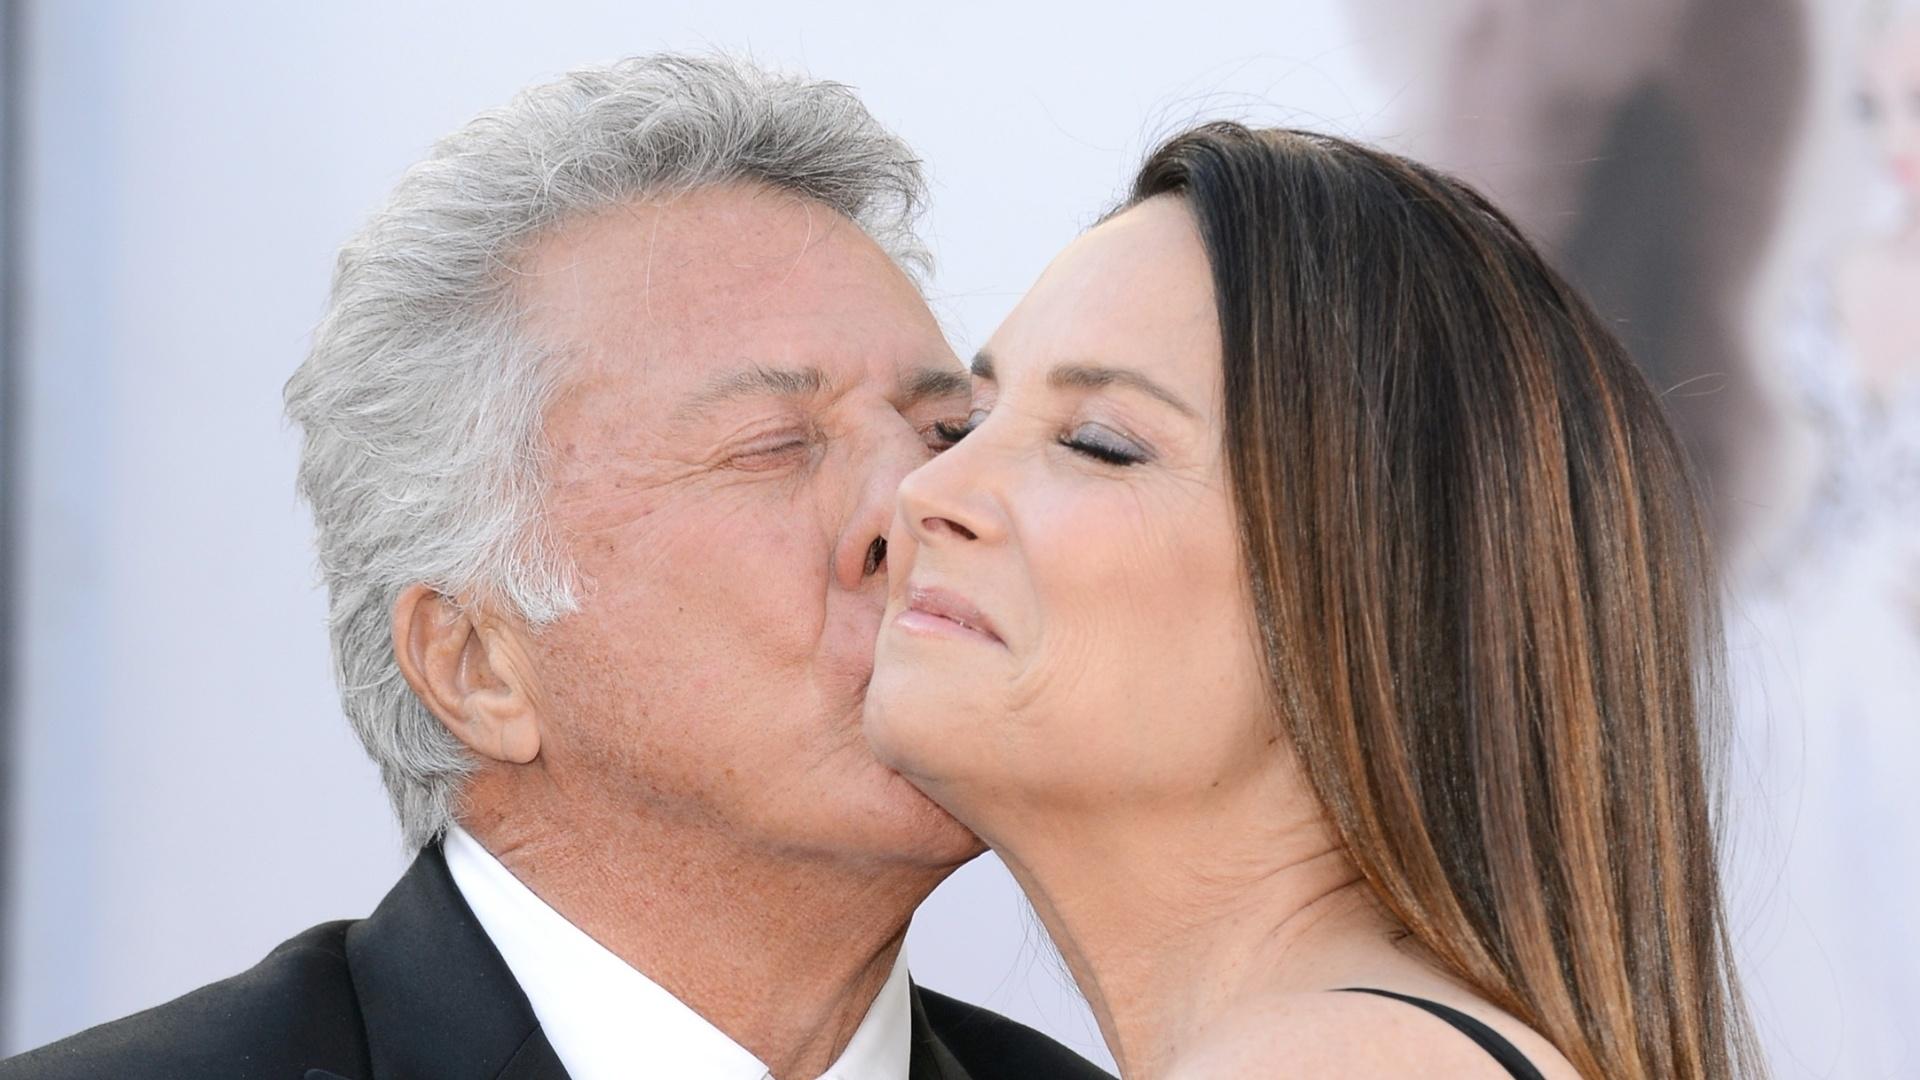 24.fev.2013 - Dustin Hoffman beija a mulher, Lisa Hoffman, no tapete vermelho do Oscar 2013